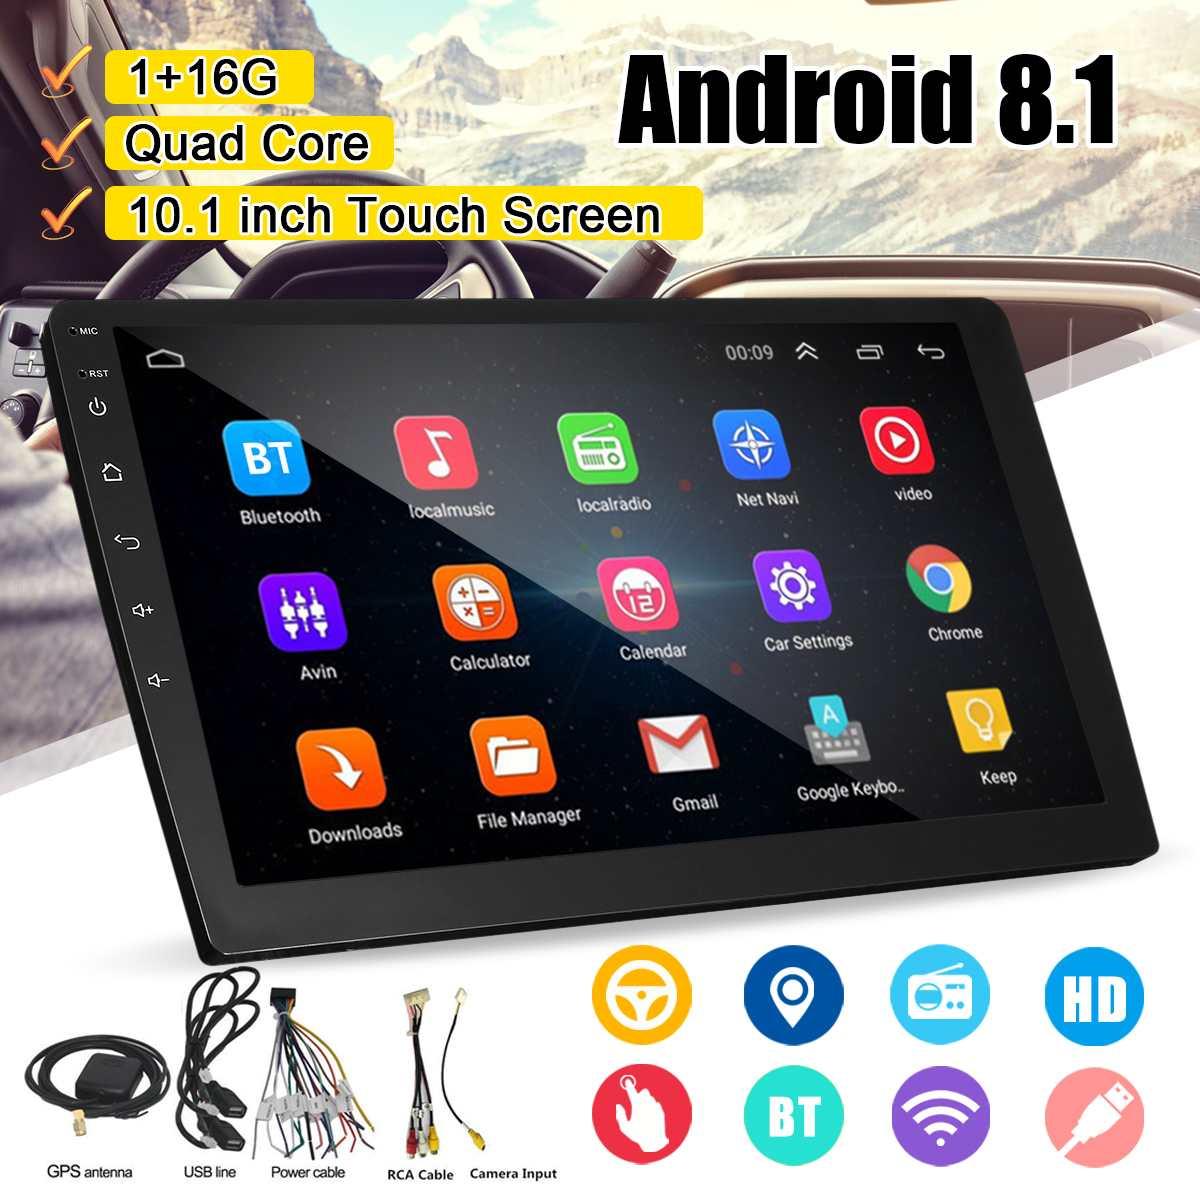 10 1 Inch Android 8 1 Quad Core 1 16G font b Car b font Multimedia